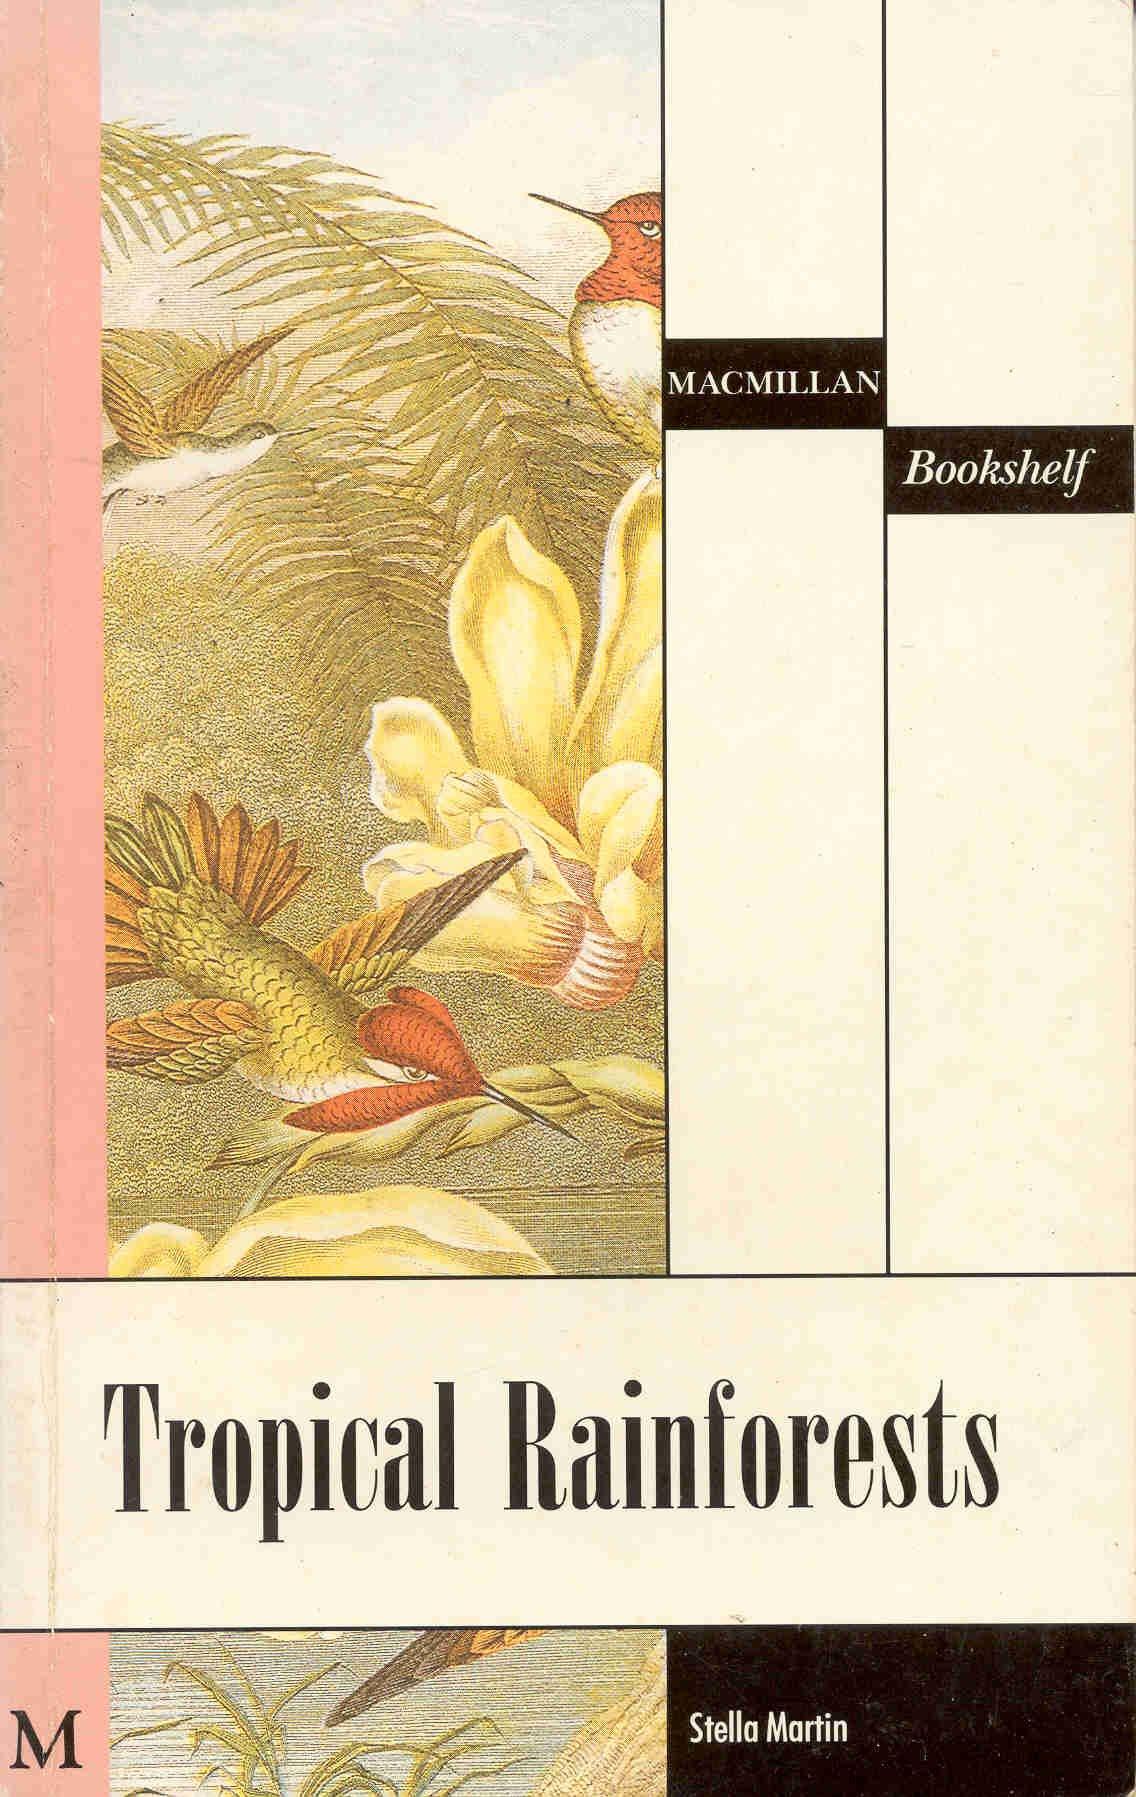 Macmillan Bookshelf Tropical Rainforests Level 4 Stella Martin 9780333546635 Amazon Books